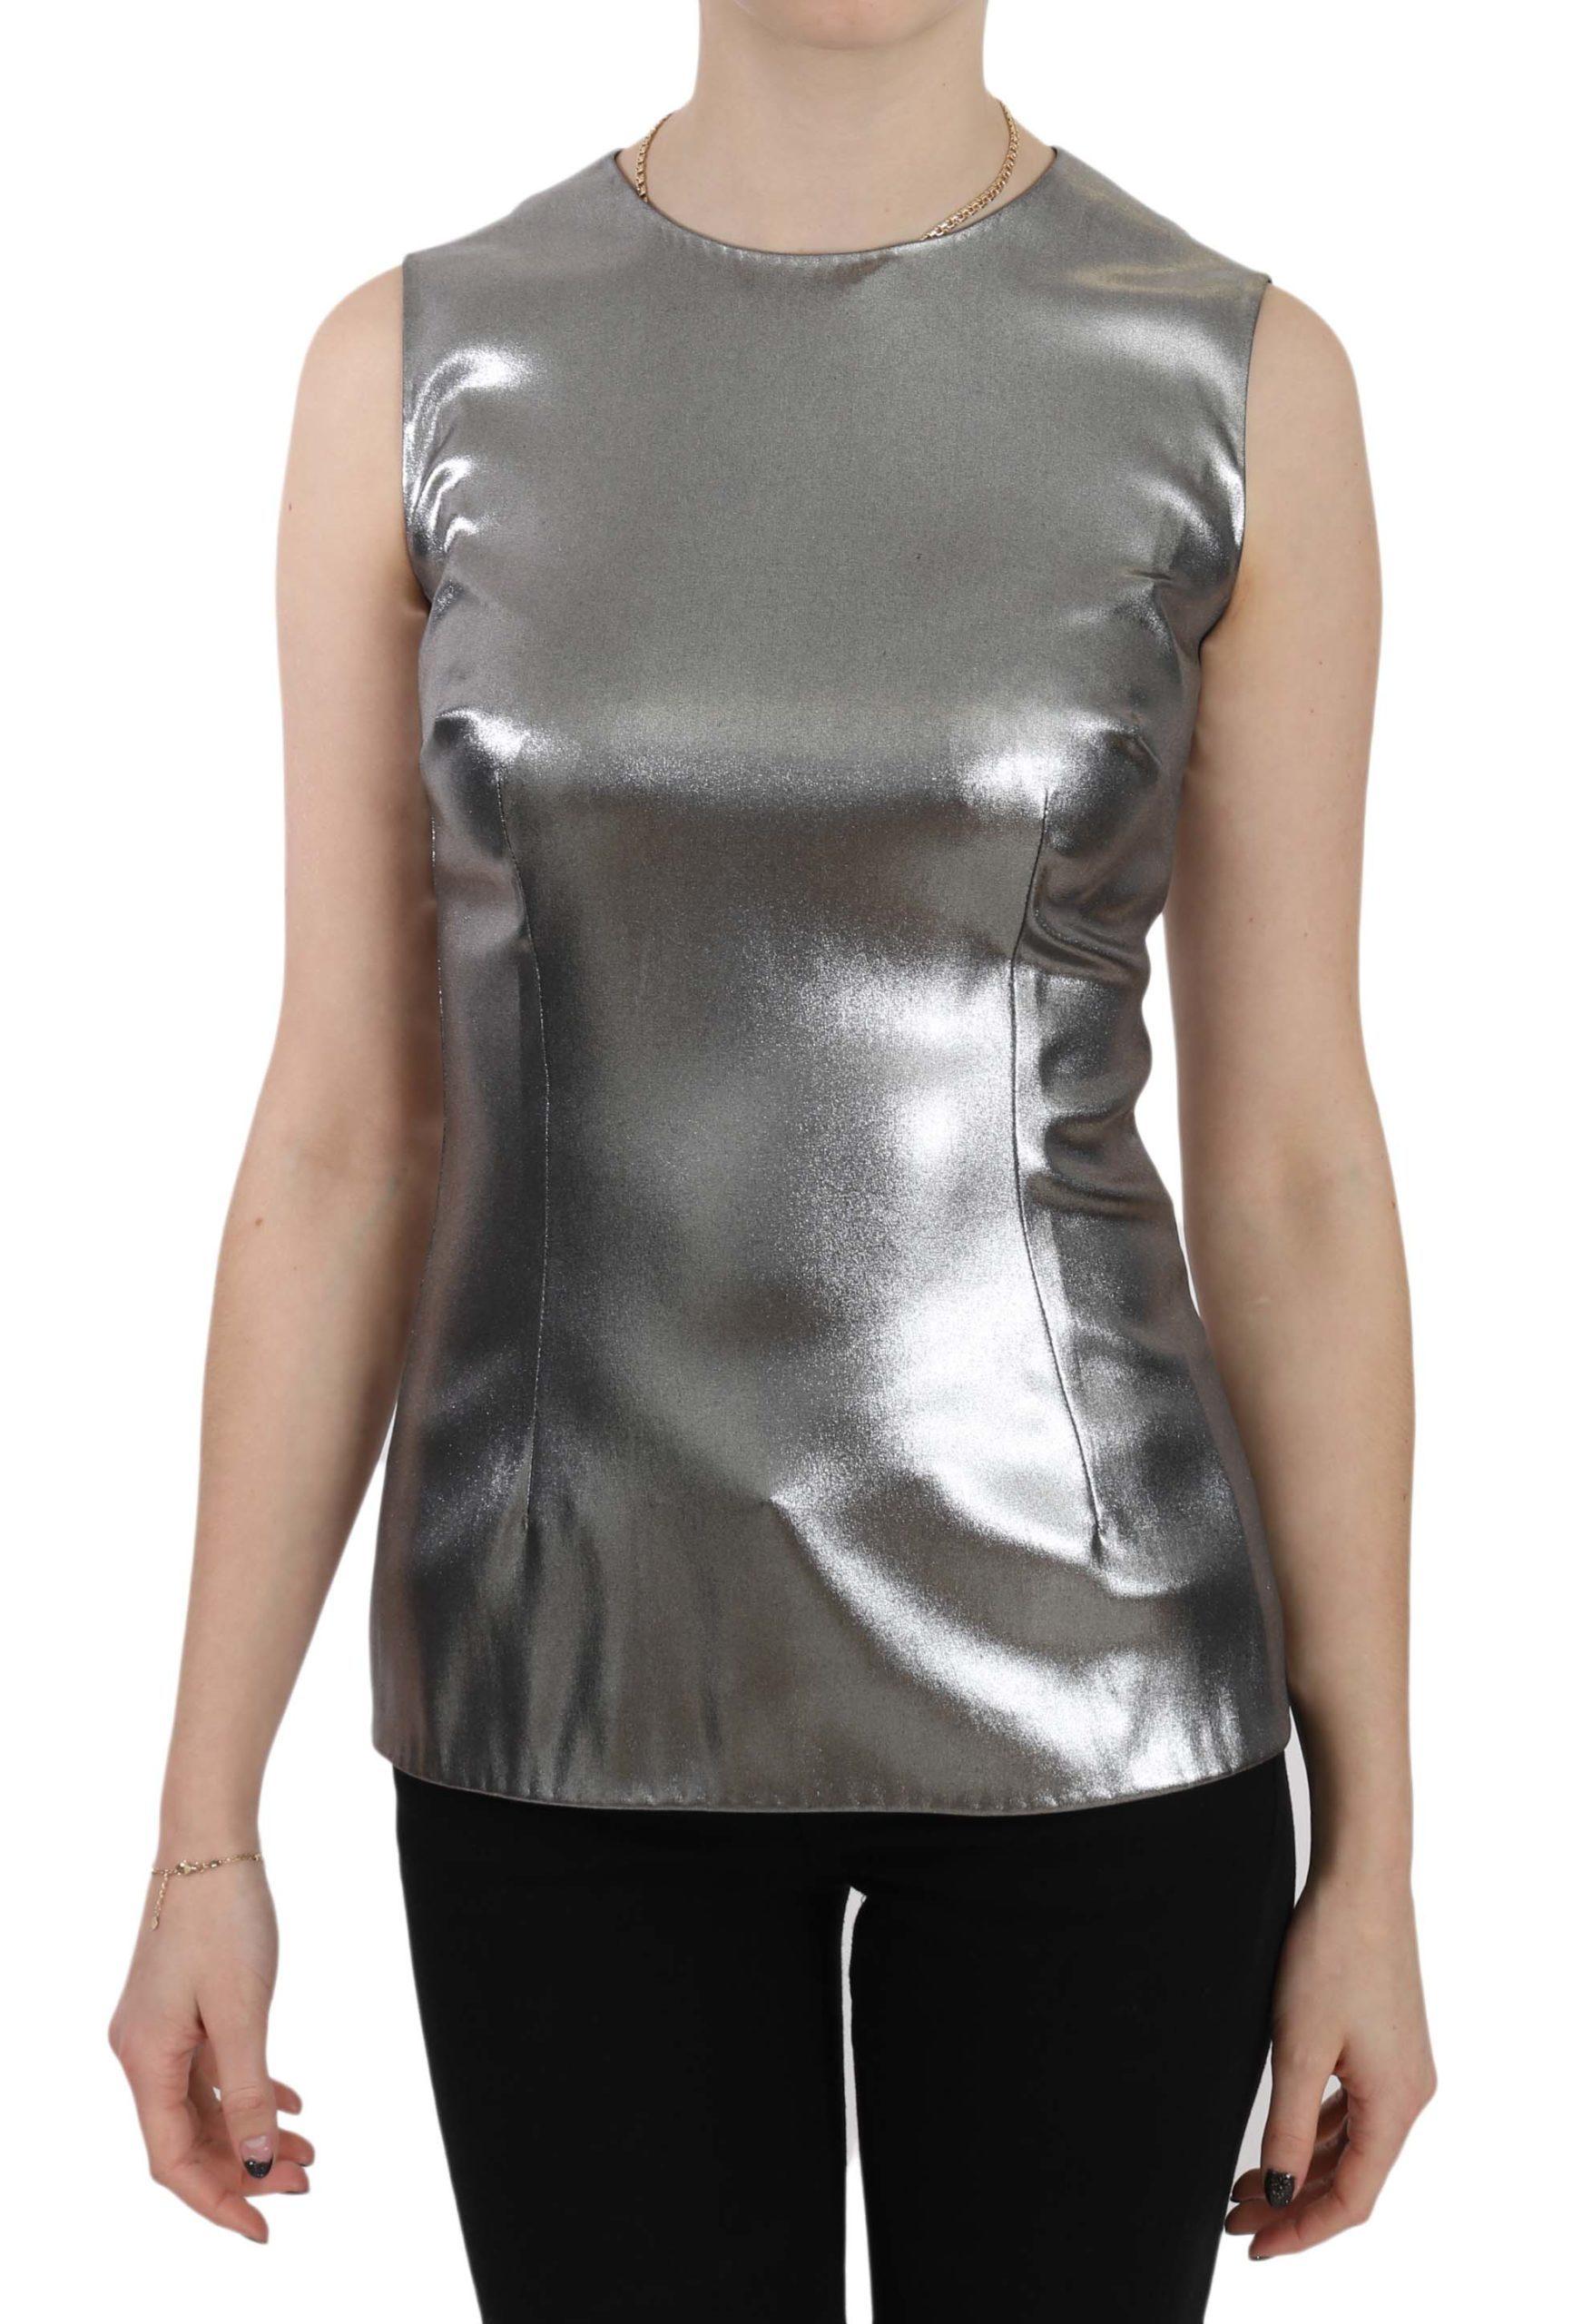 Dolce & Gabbana Women's Tulle Sleeveless Silk Top Silver TSH3251 - IT40|S